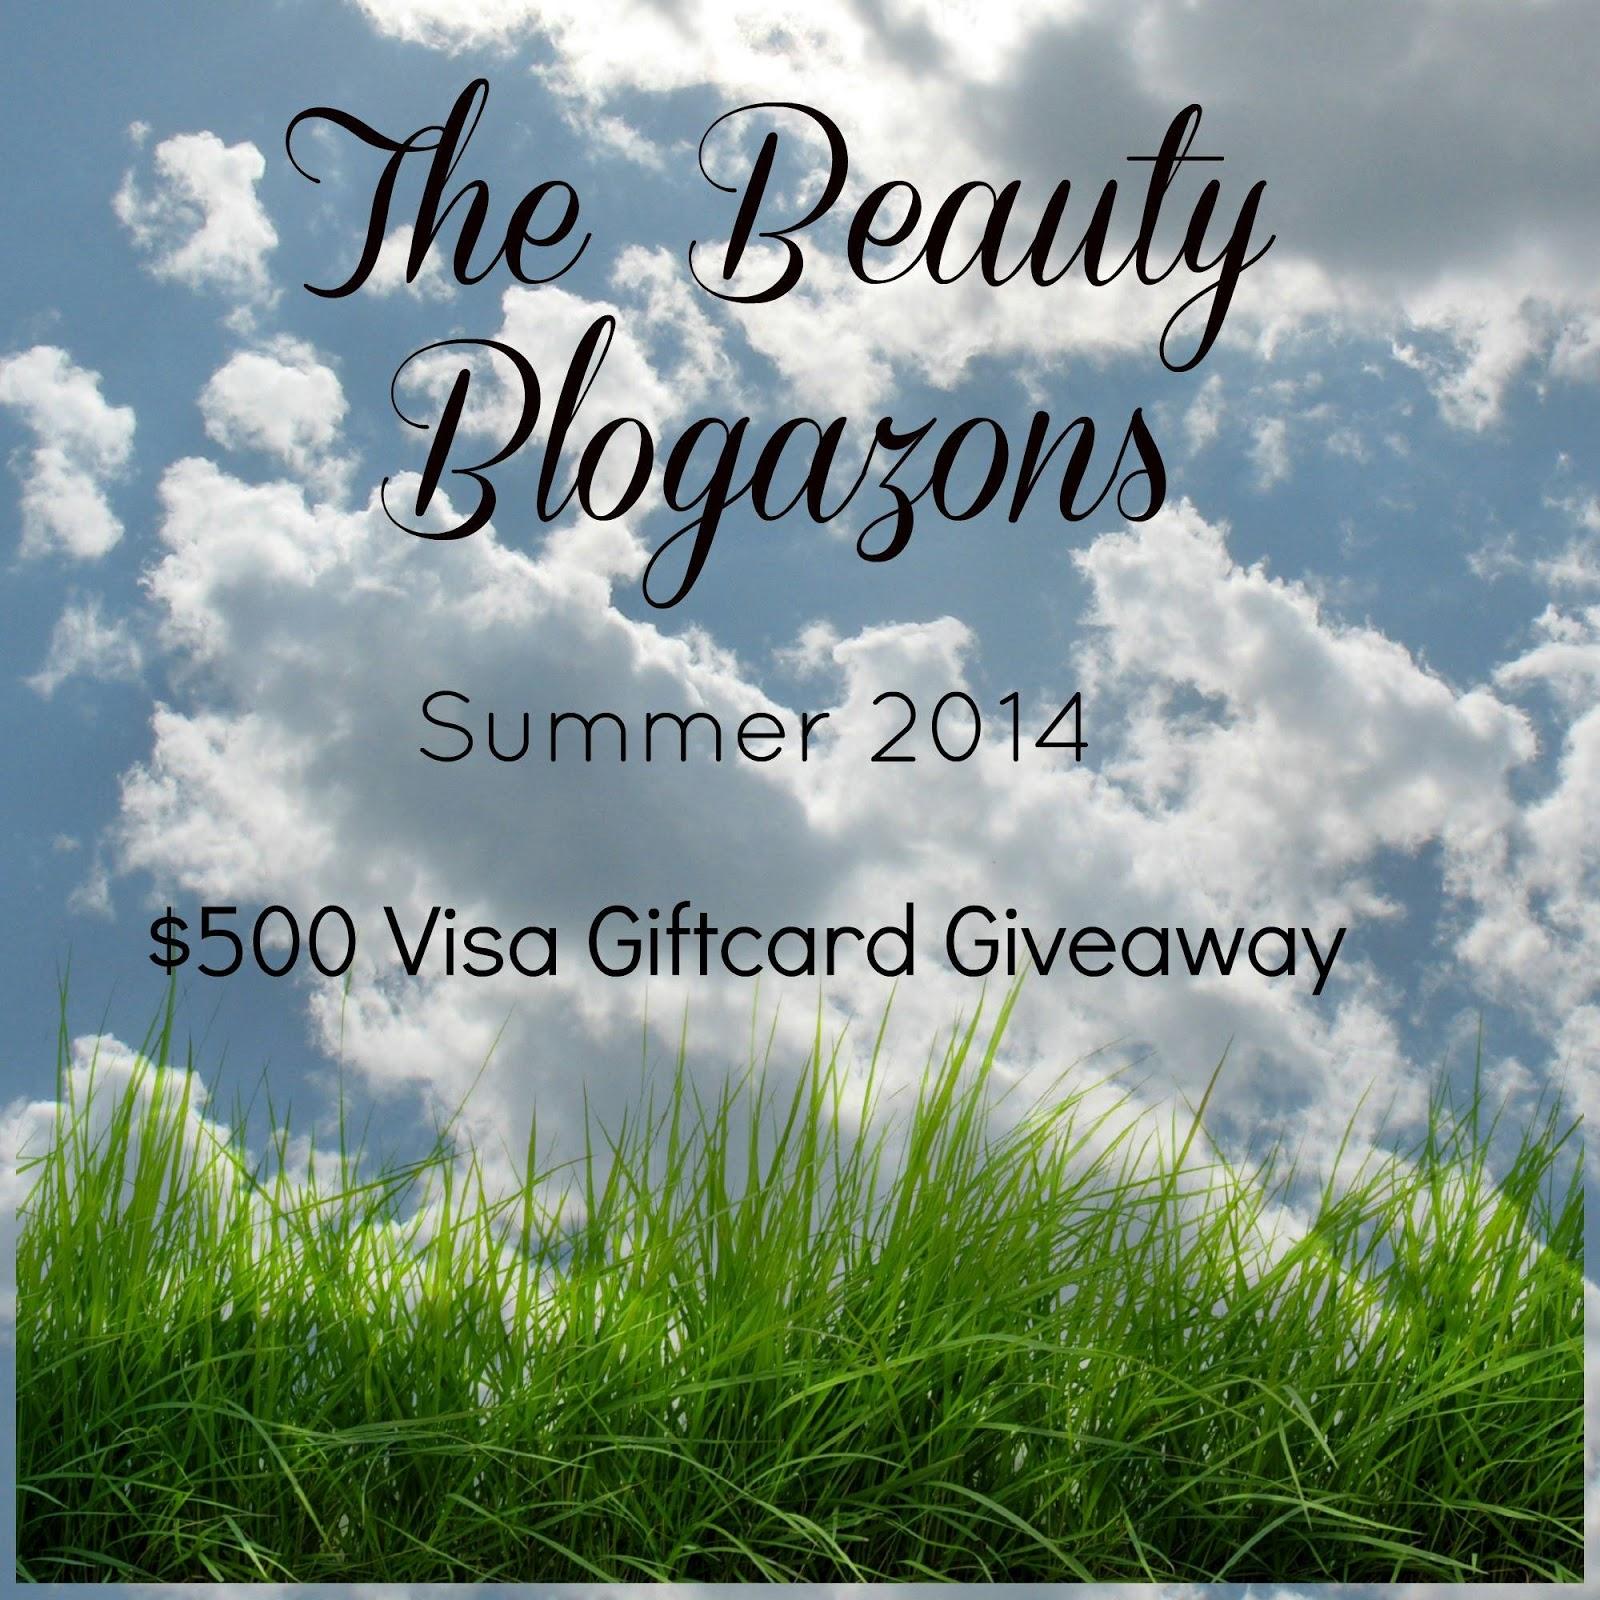 Beauty Blogazons Summer 2014 Giveaway